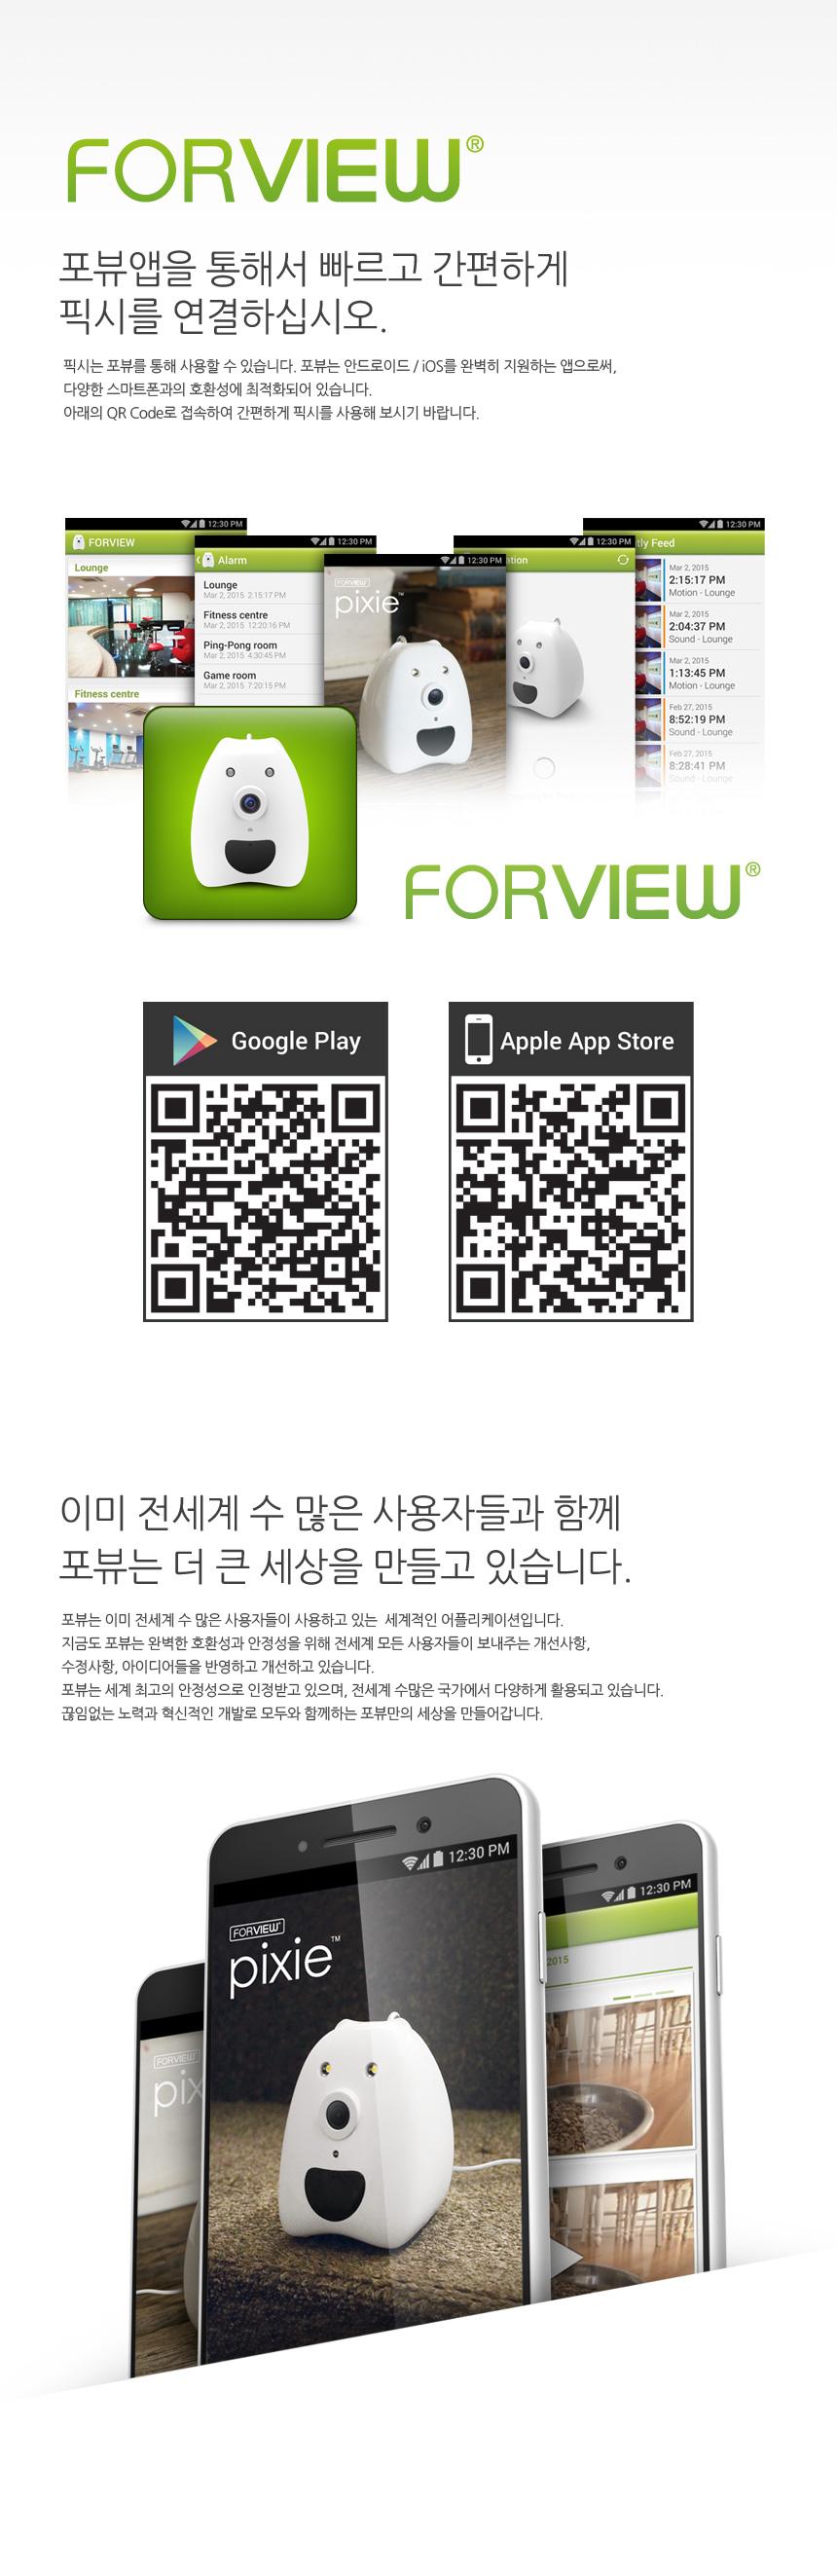 Forview 앱